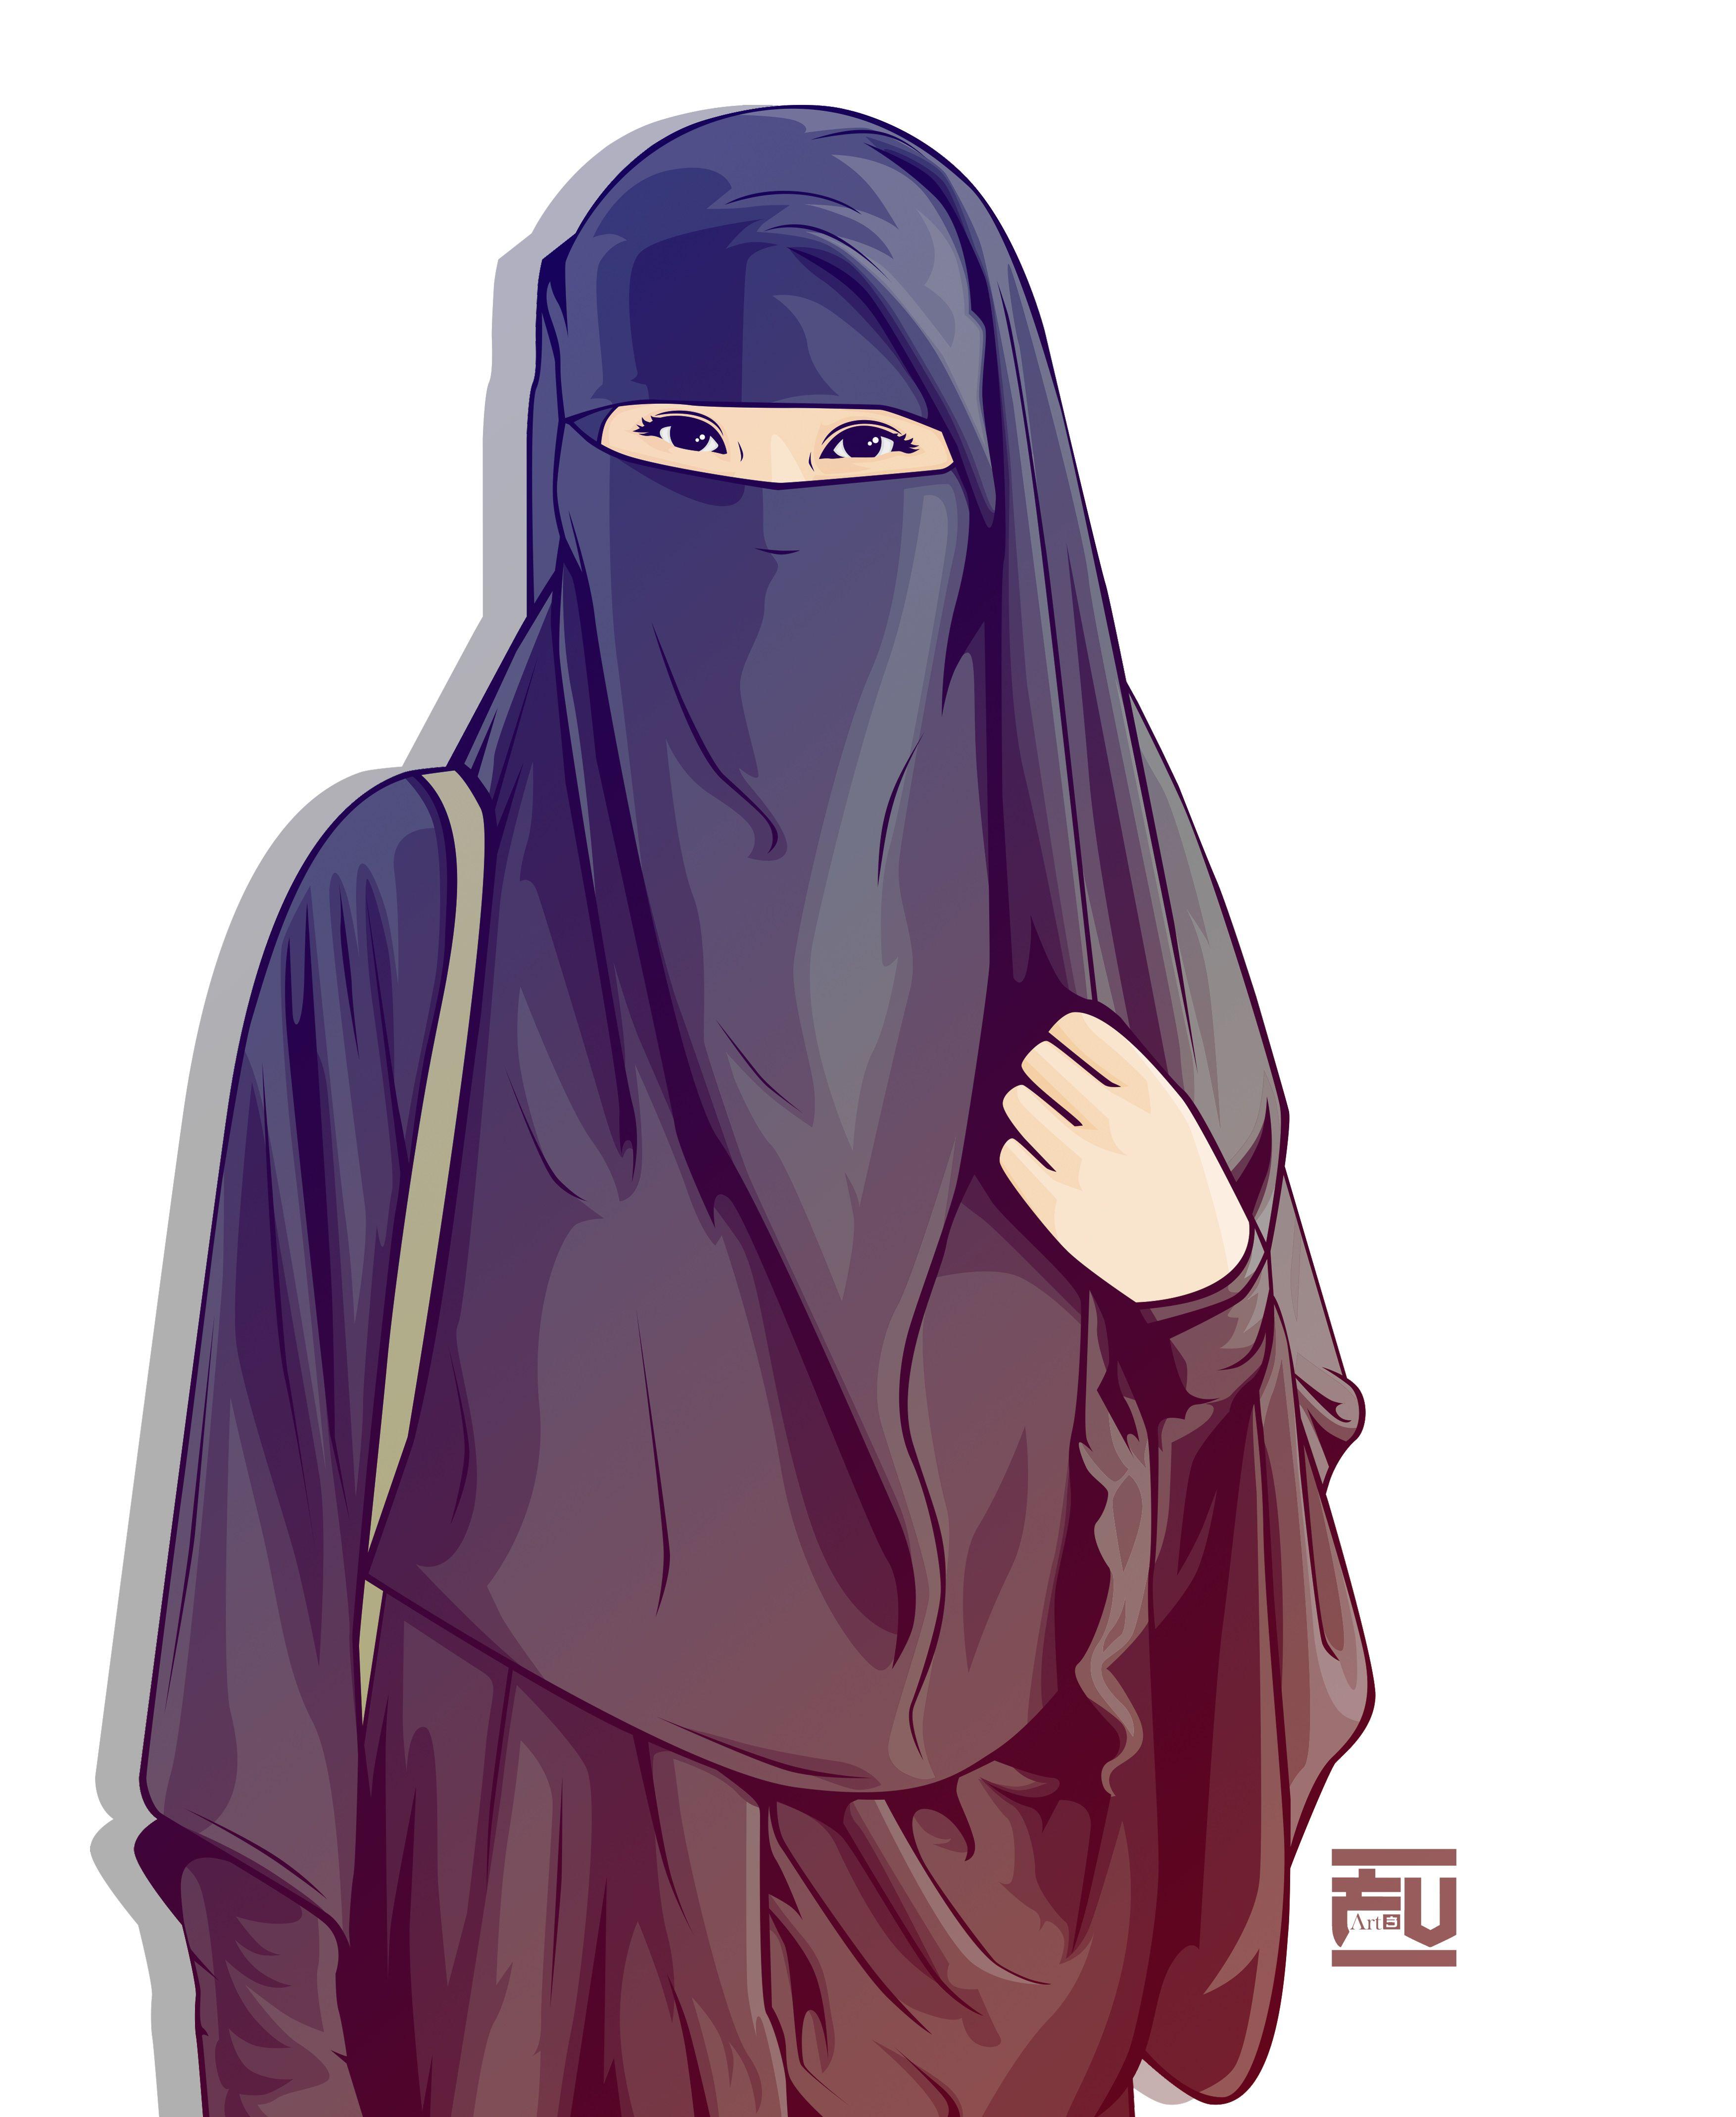 Hijab Vector Niqab ahmadfu22 Islam, Kızlar, Anime kız